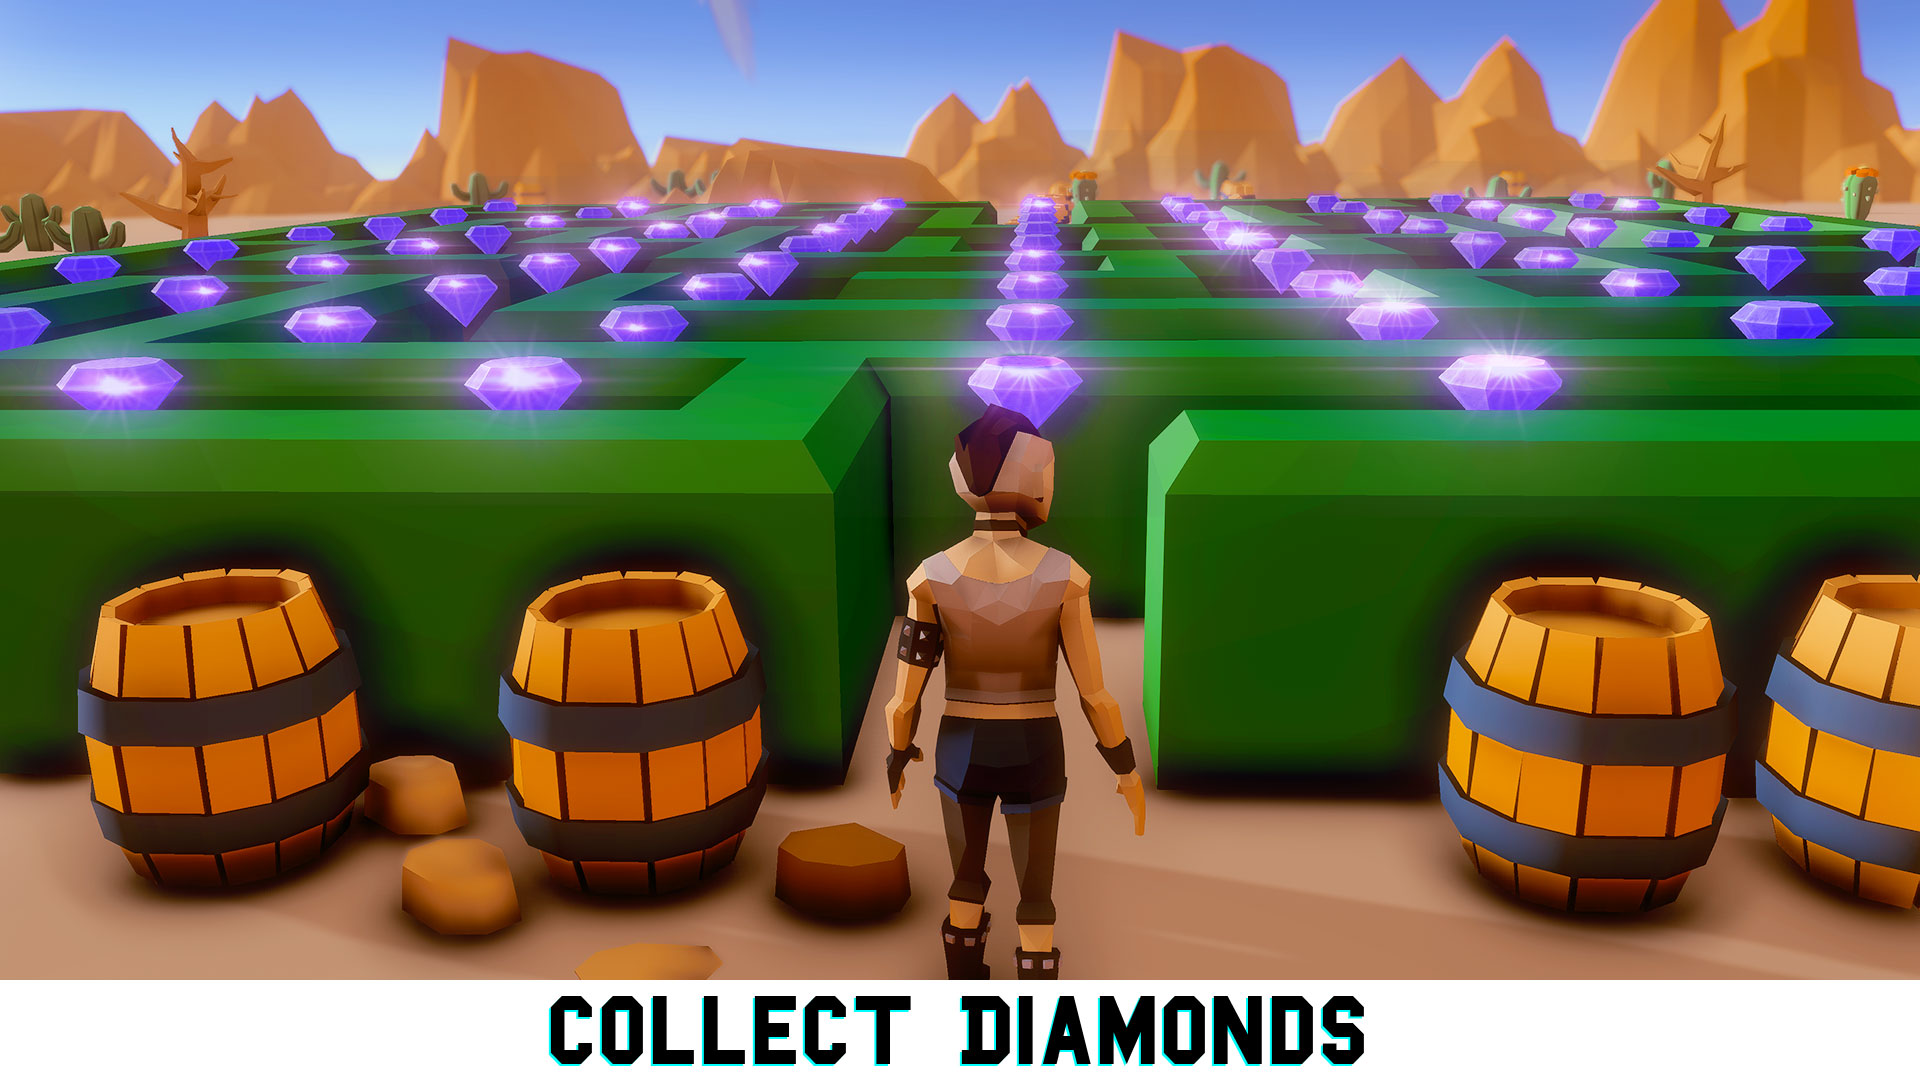 3D Maze Labyrinth Adventure